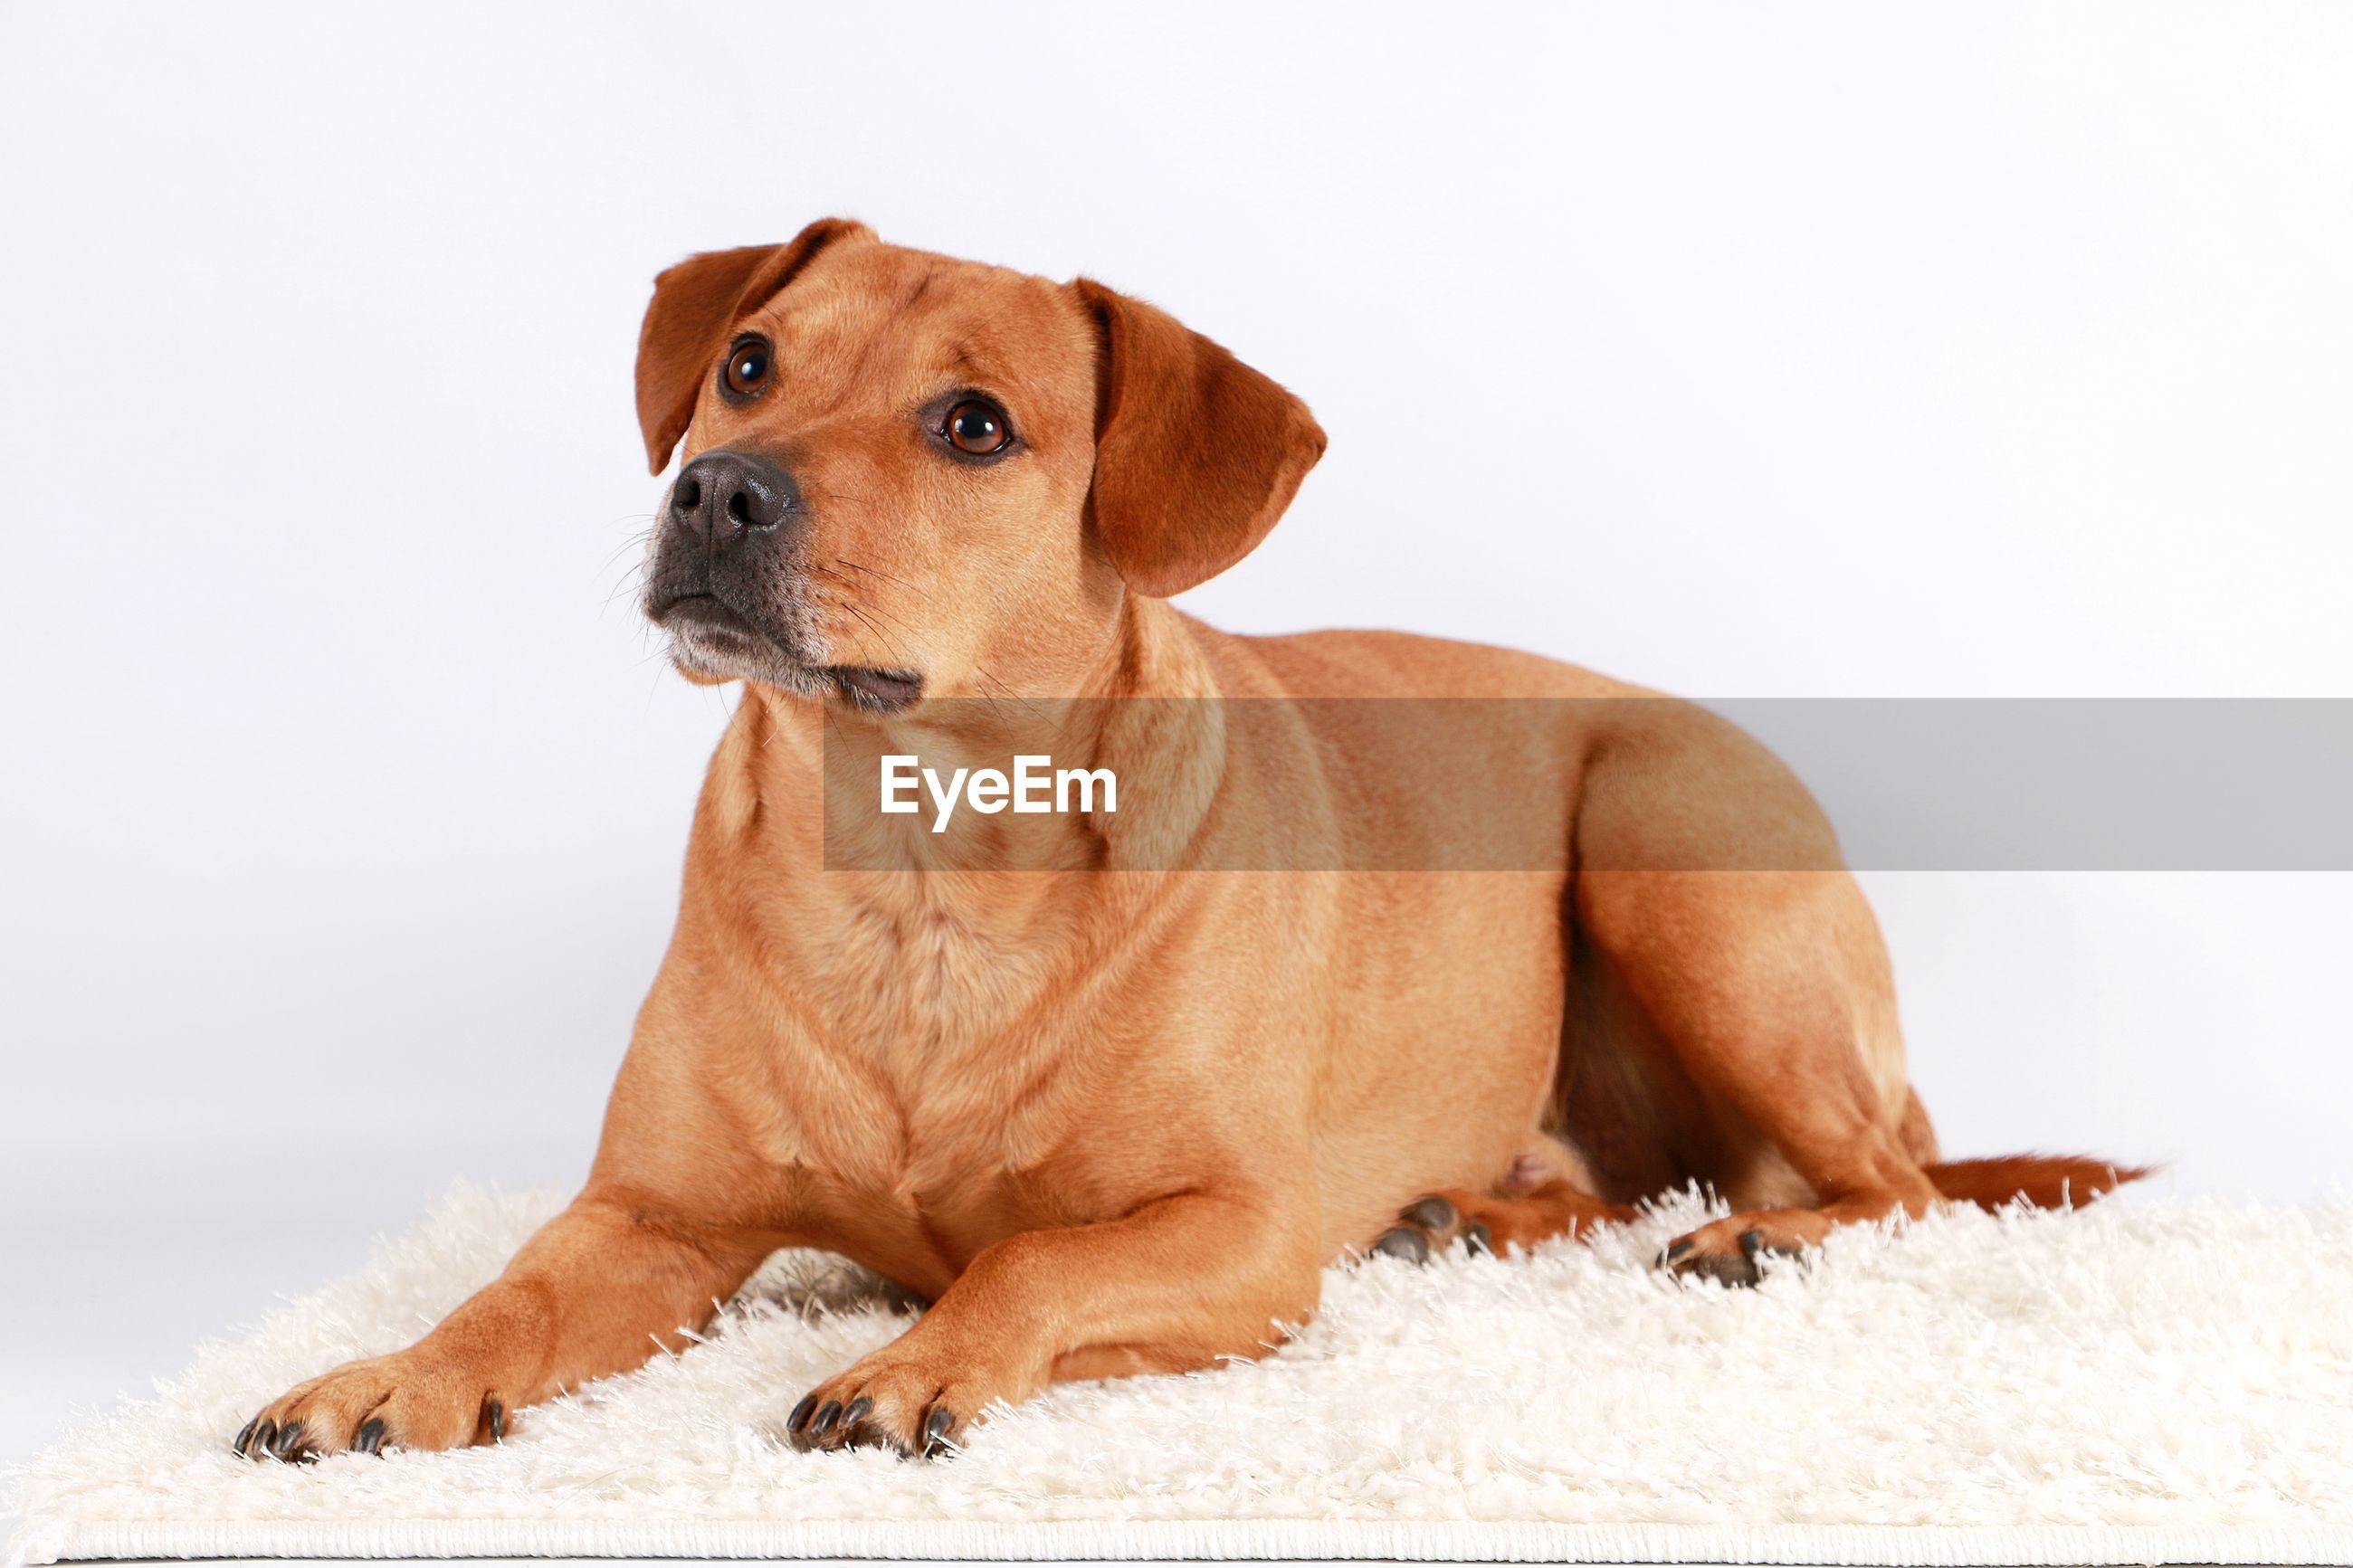 Close-up of dog sitting against white background